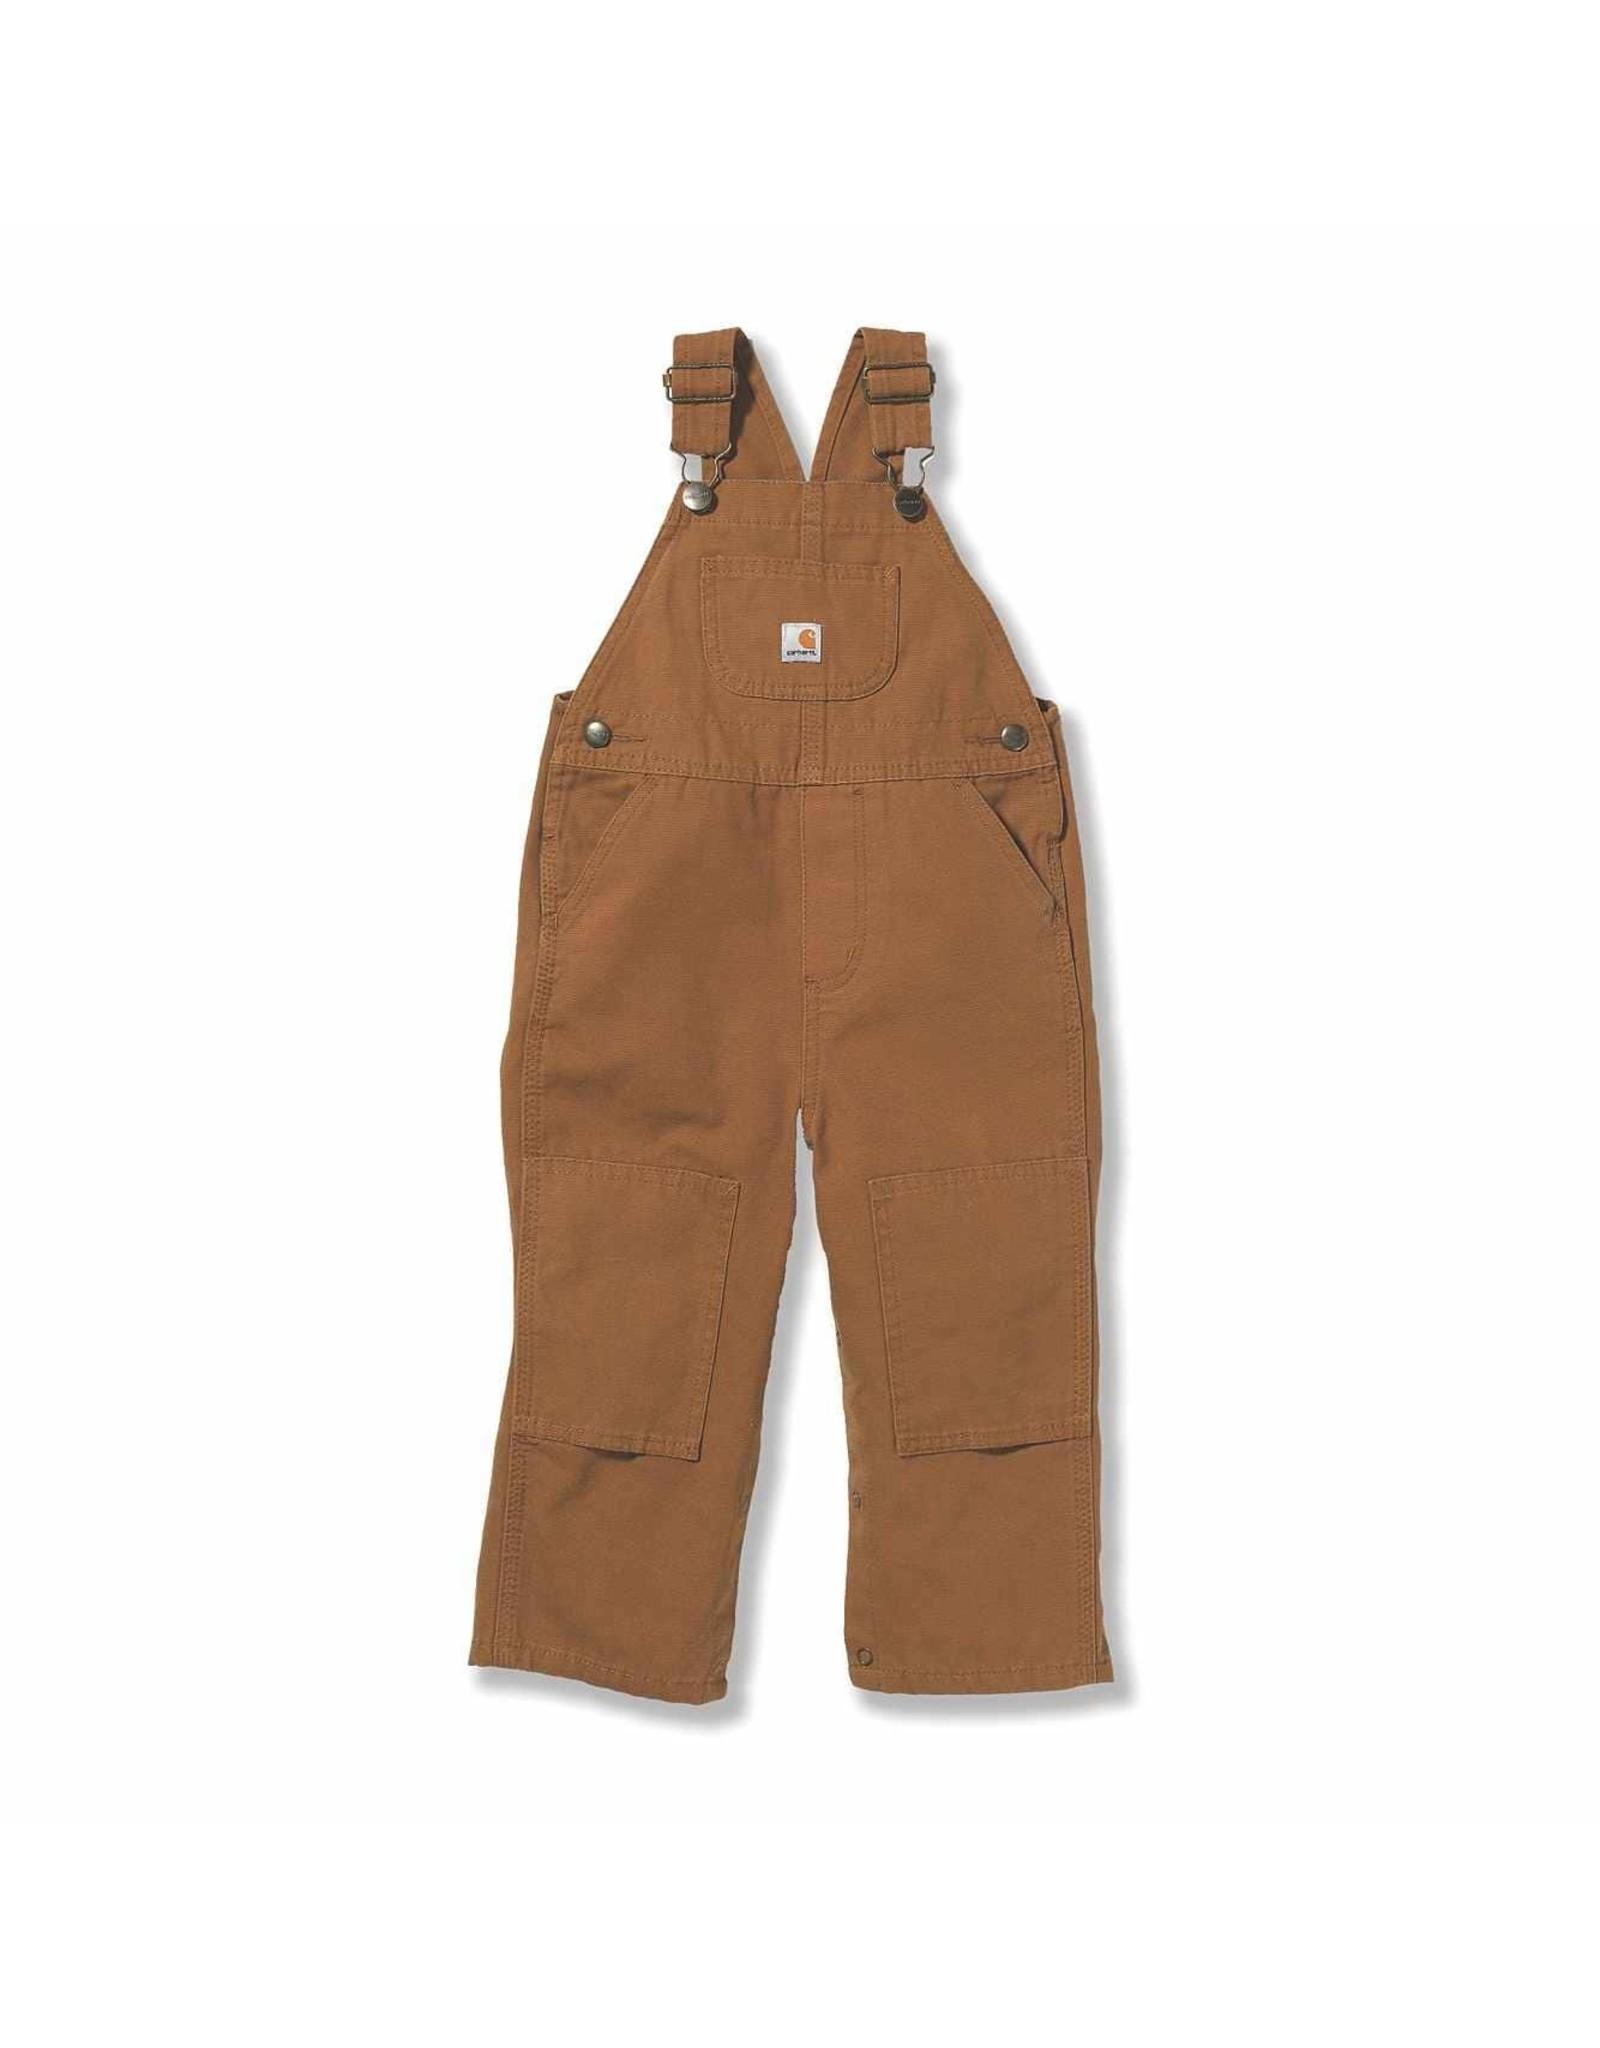 Carhartt Carhartt CM8609 Boys Overalls Sizes 4-6